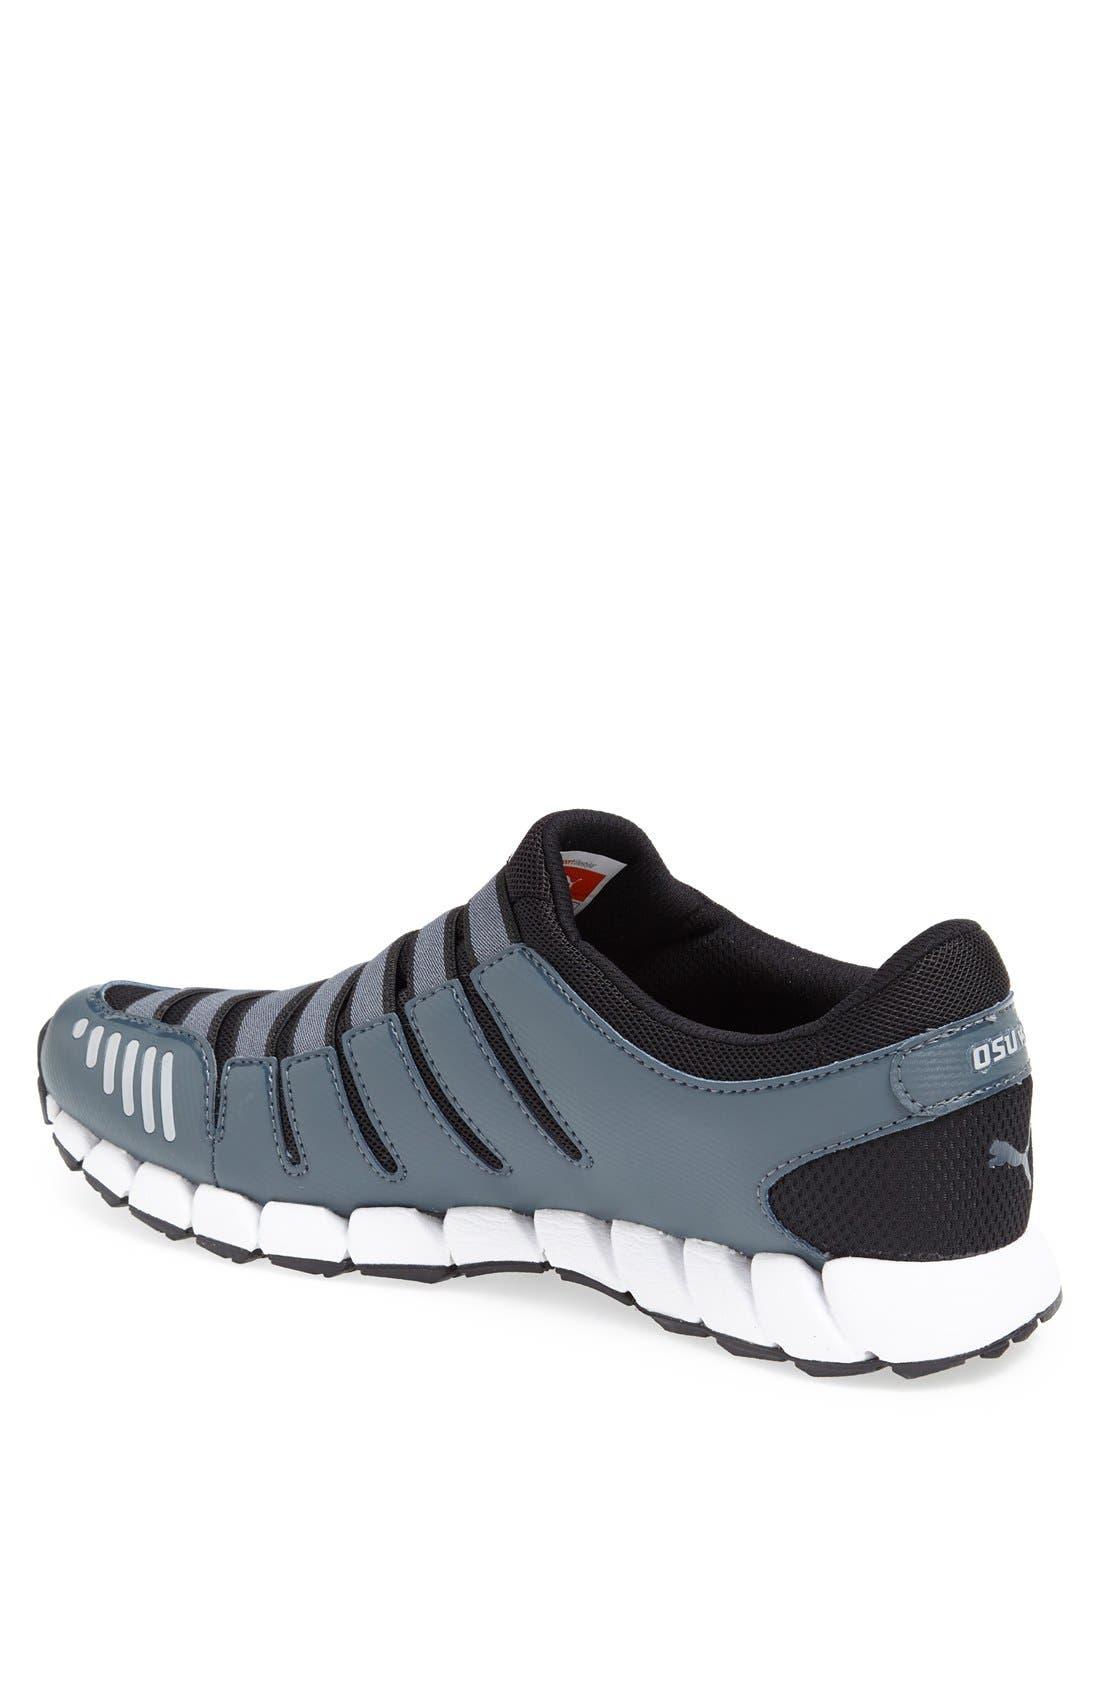 Alternate Image 2  - PUMA 'Osu V3 NM' Running Shoe (Men)